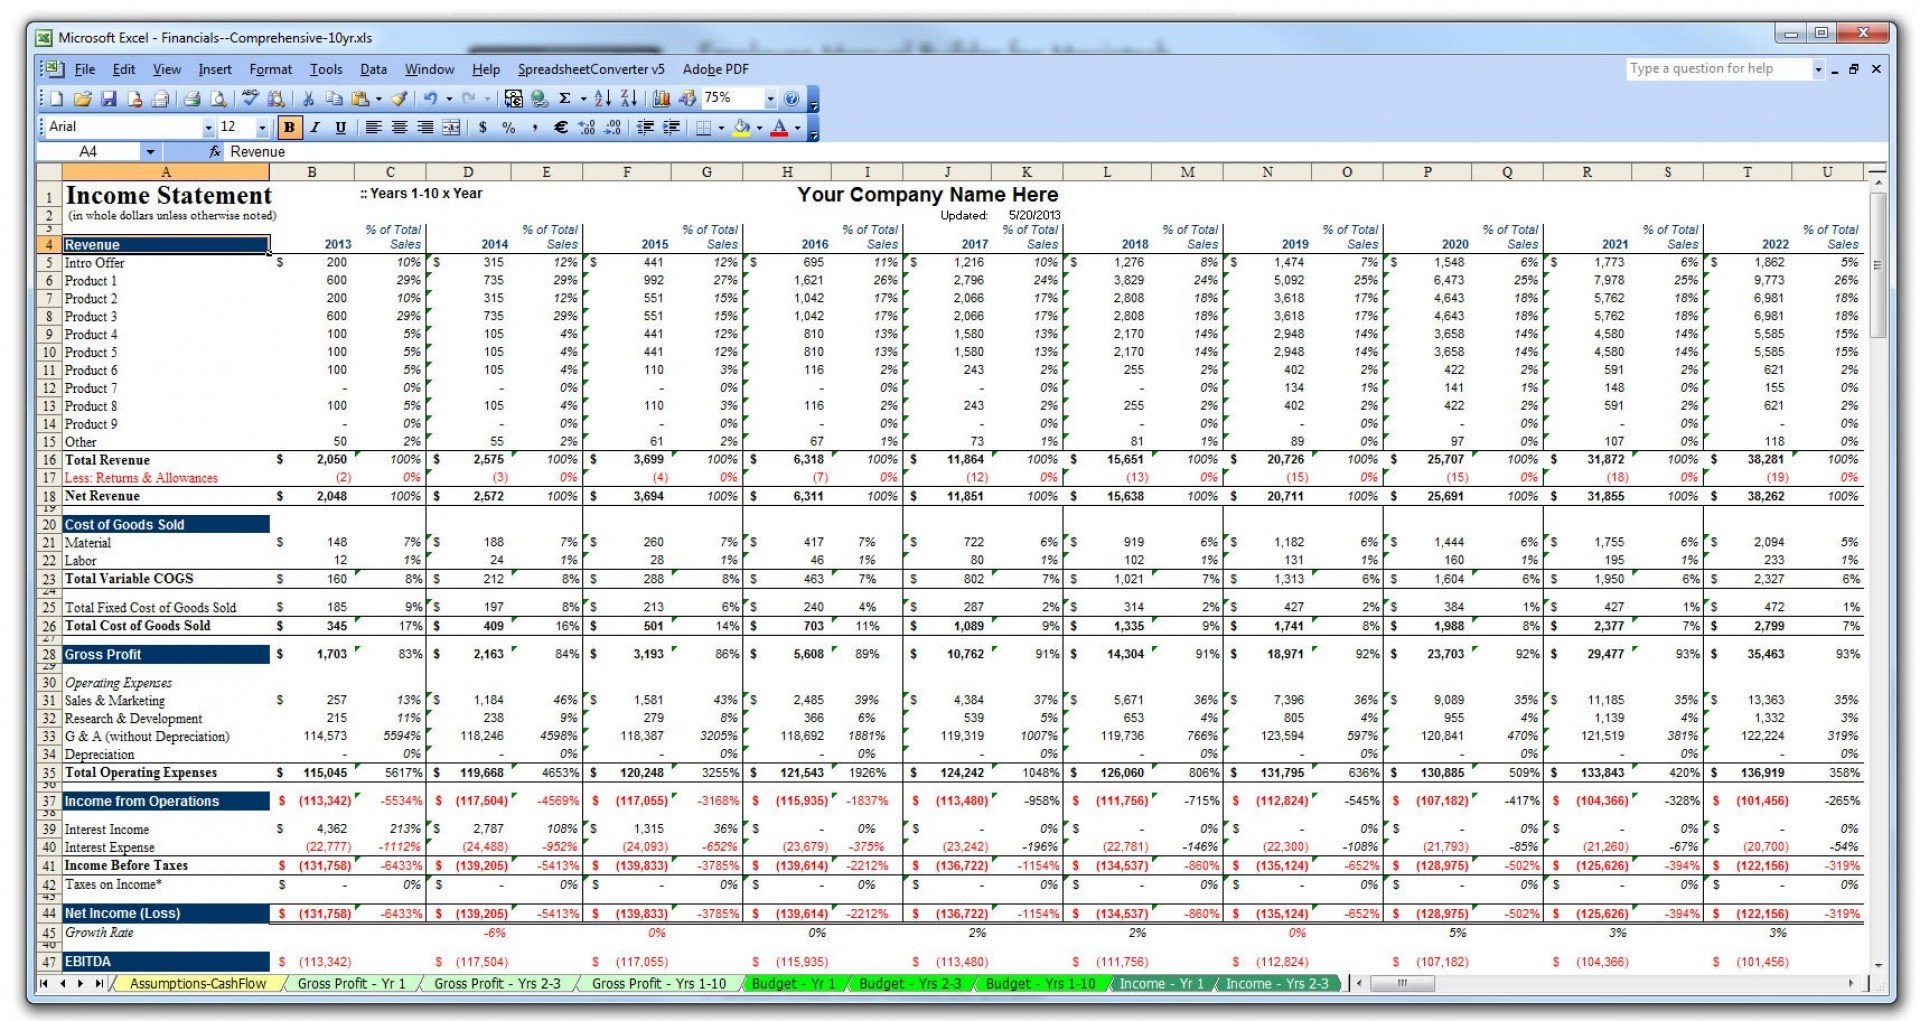 Stupendous Business Plan Financial Template Templates For A New ... Intended For Business Plan Financial Template